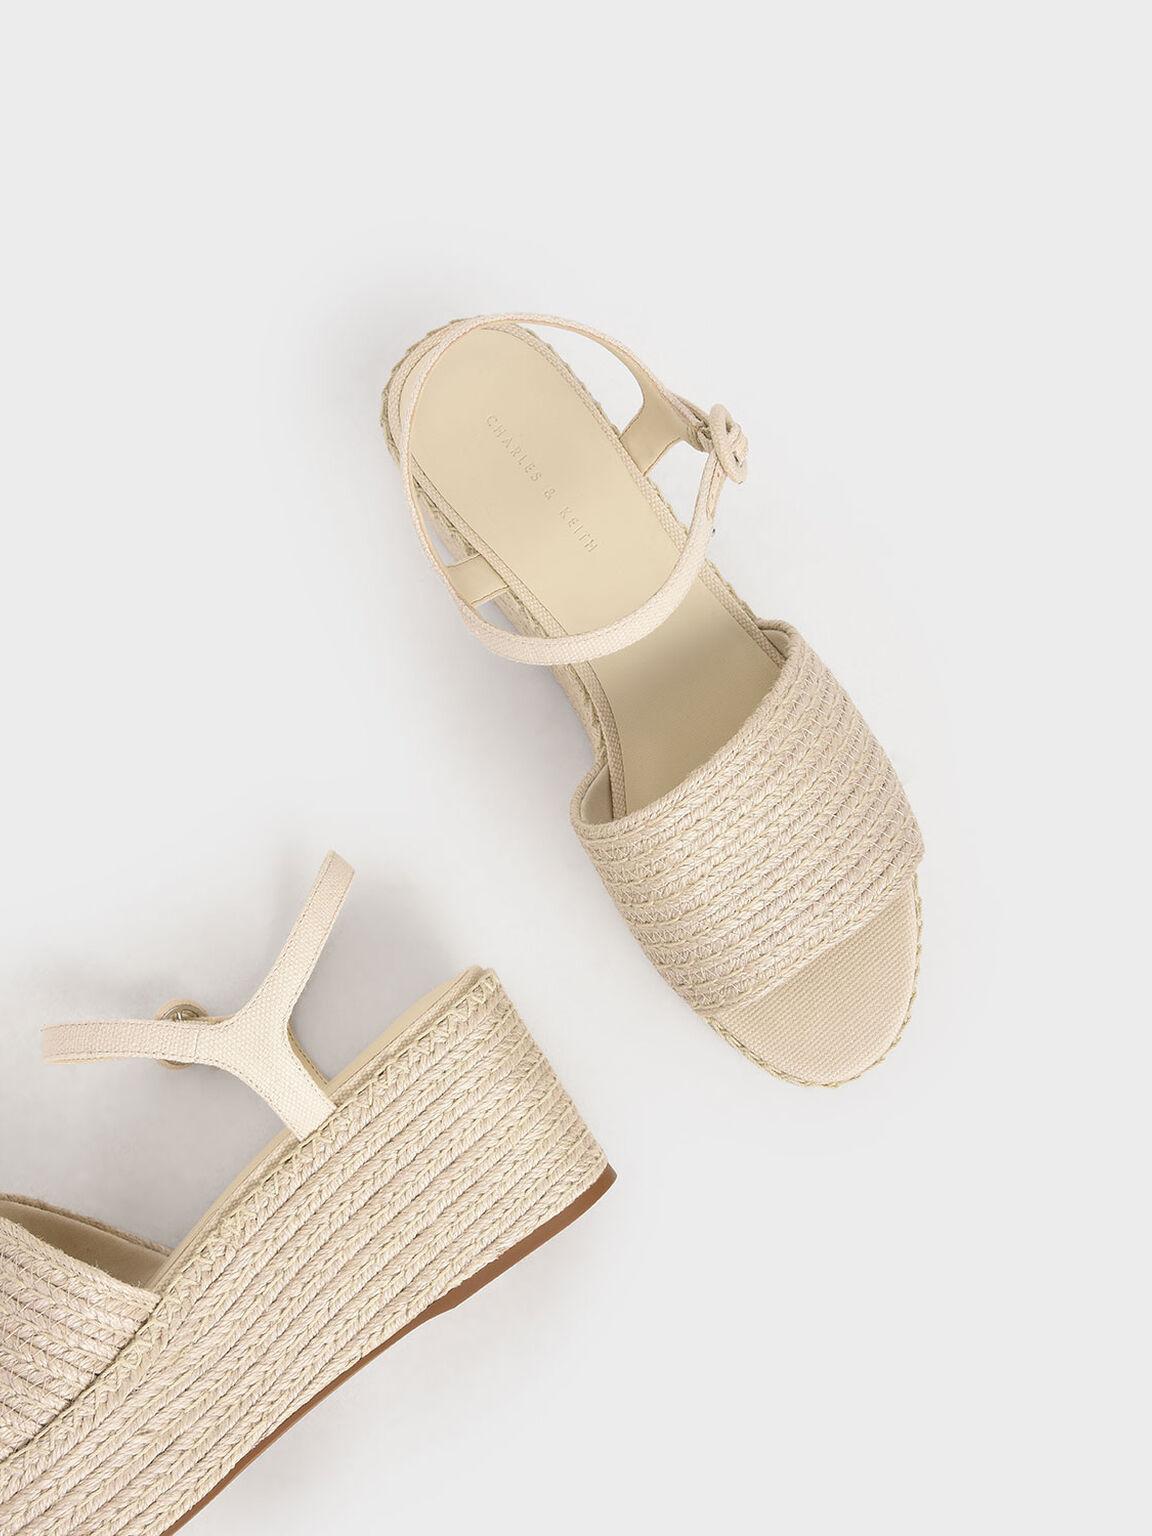 麻繩厚底涼鞋, 奶油色, hi-res